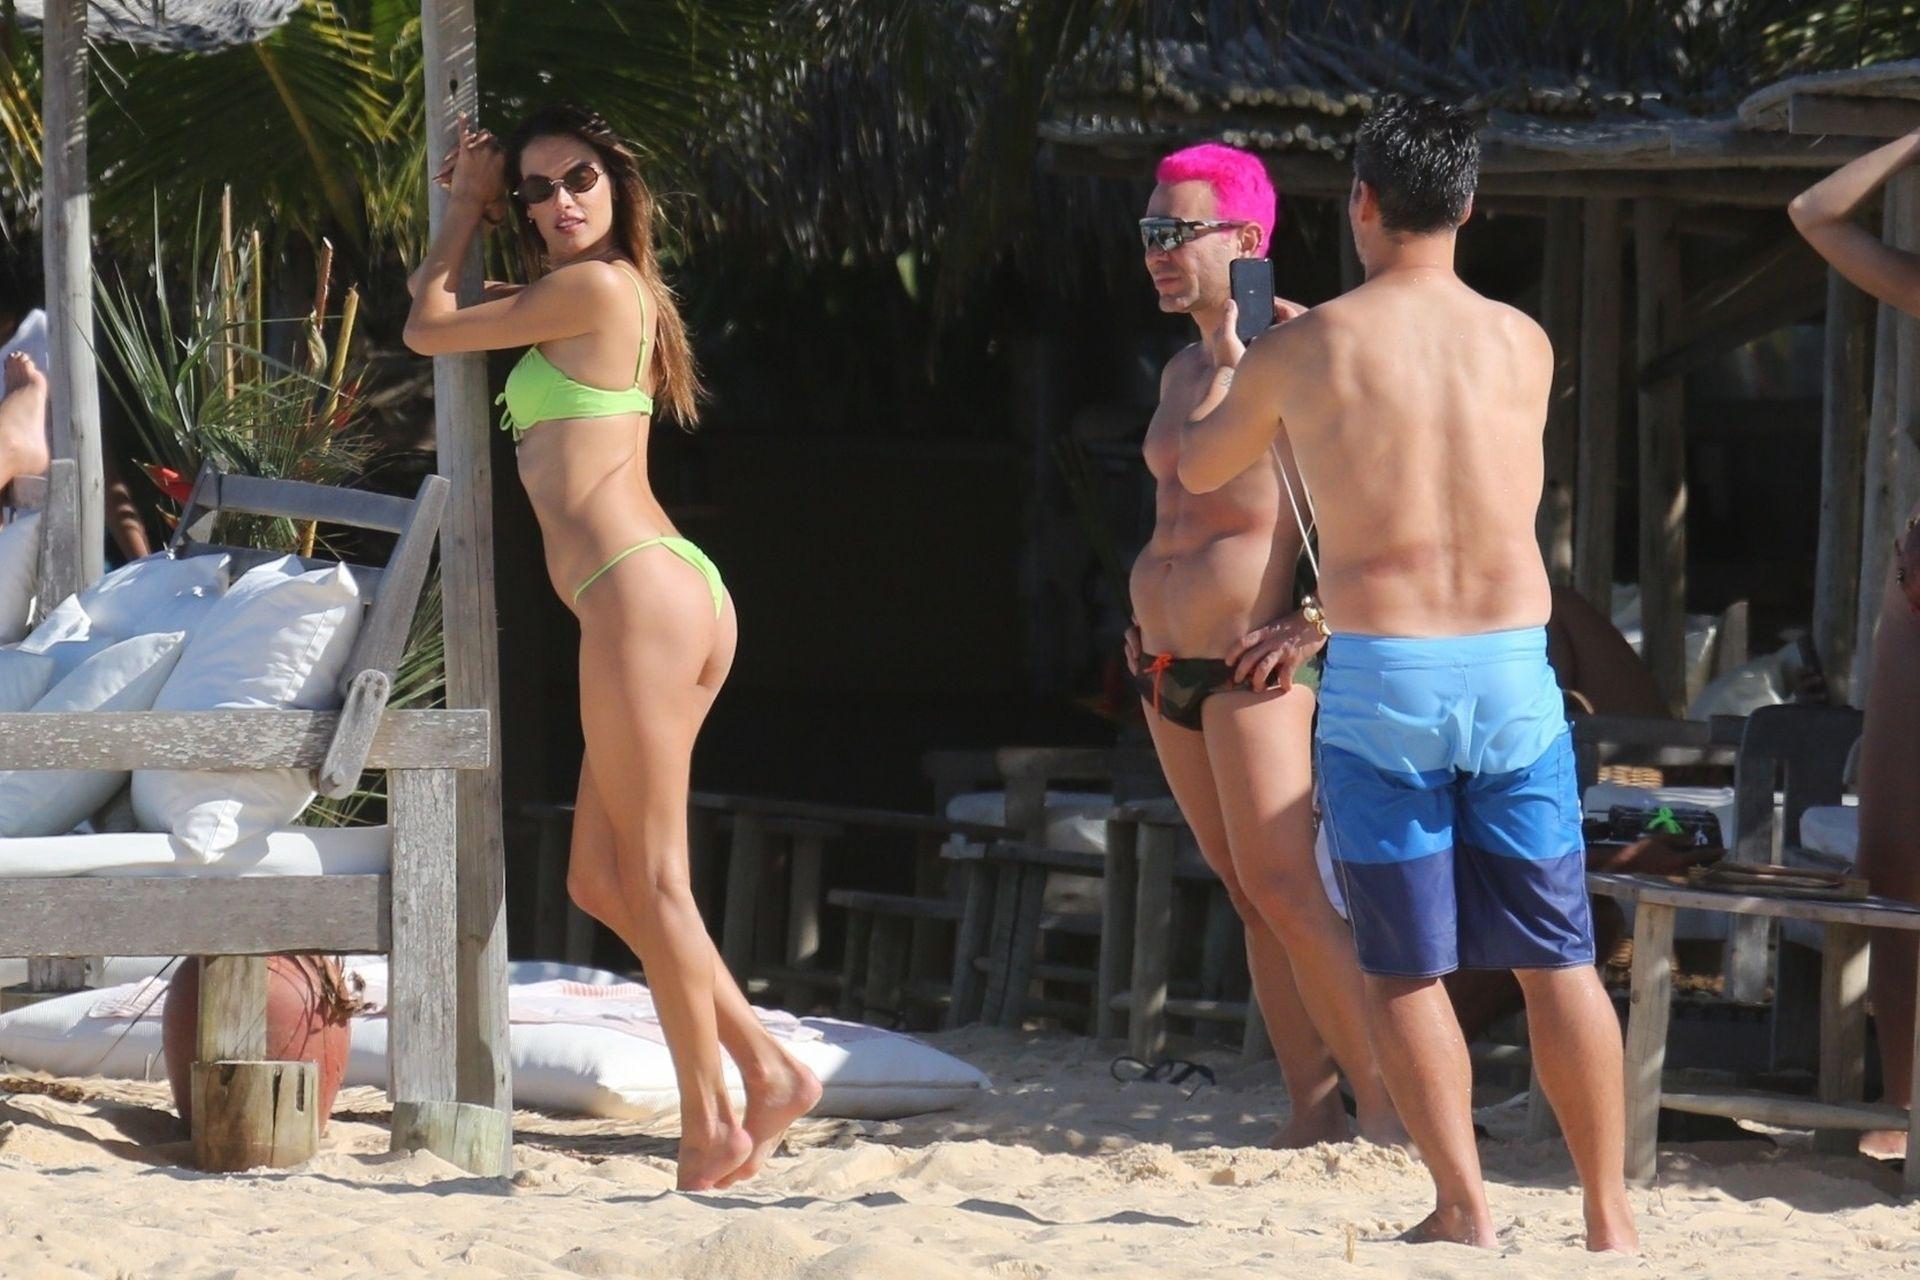 Alessandra-Ambrosio-Sexy-The-Fappening-Blog-1031.jpg